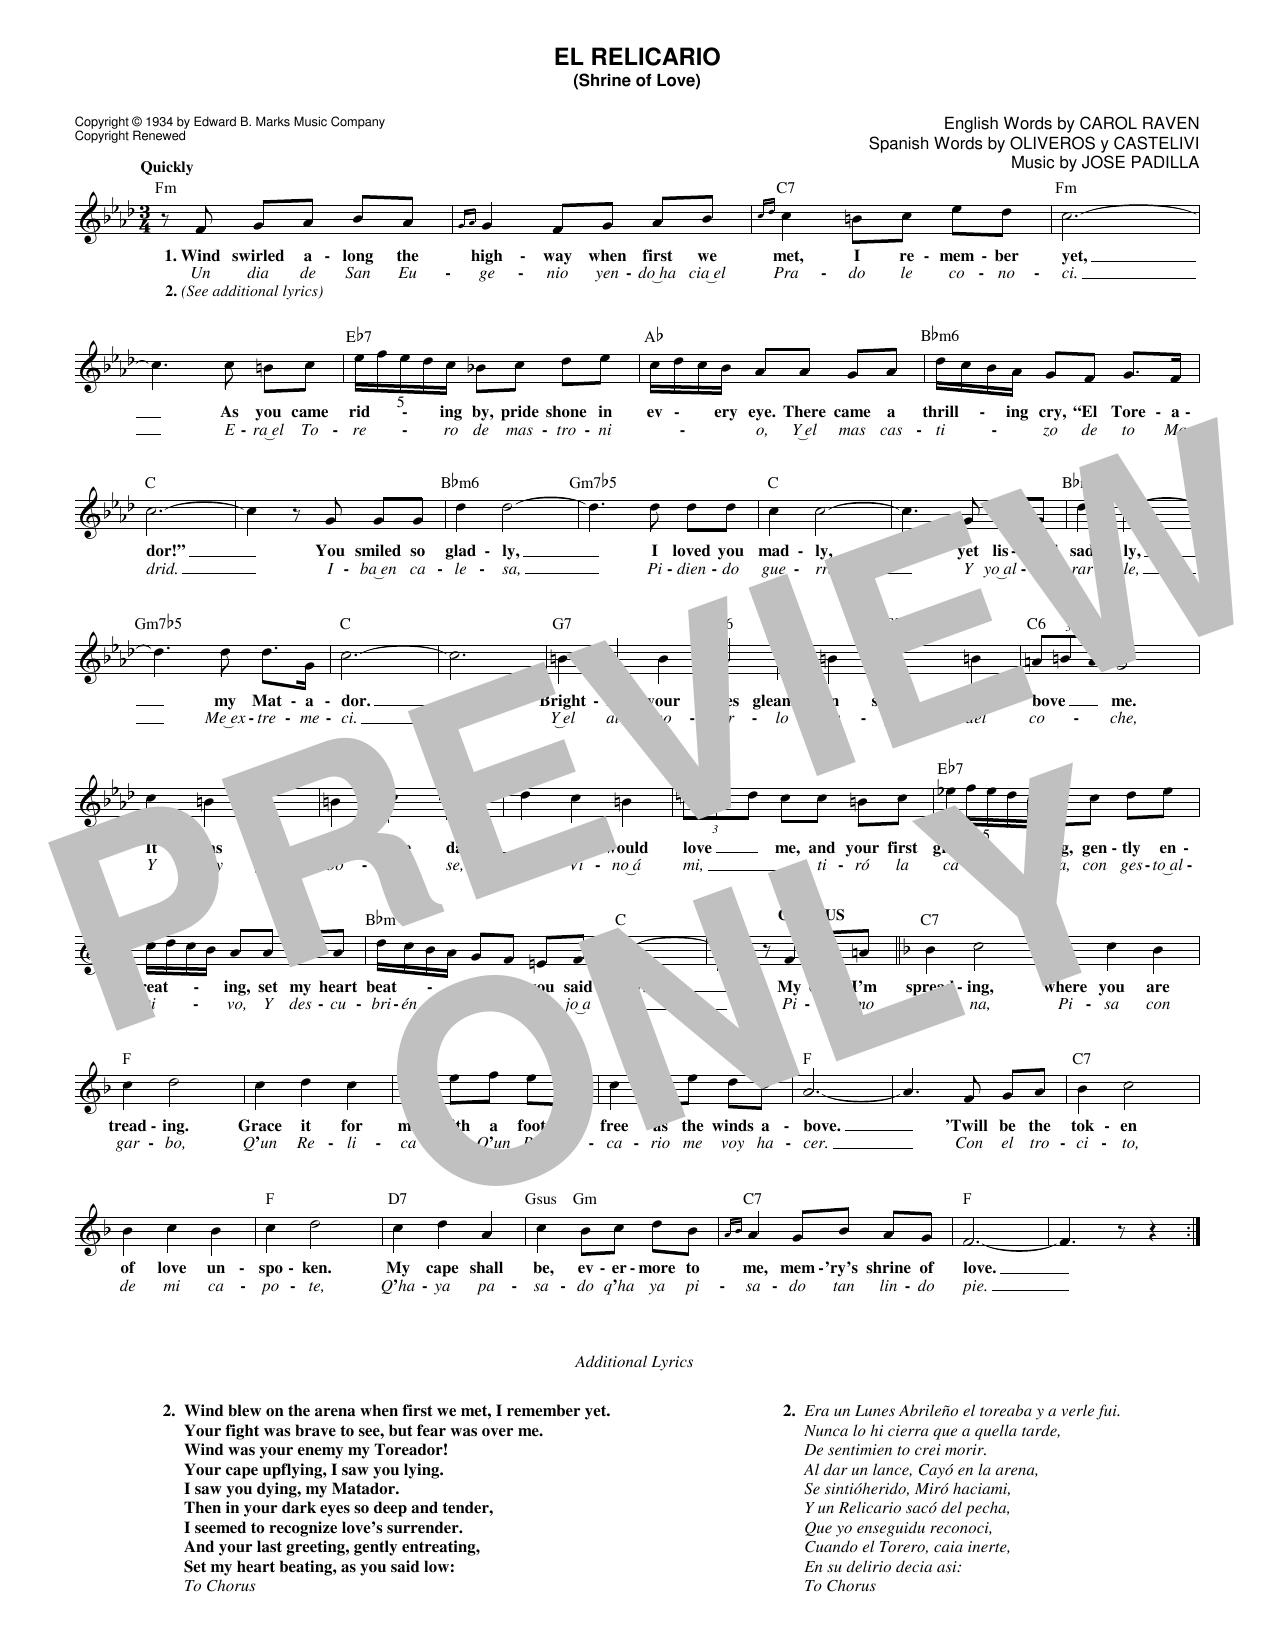 Carol Raven 'El Relicario (Shrine Of Love)' Sheet Music Notes, Chords |  Download Printable Melody Line, Lyrics & Chords - SKU: 182725